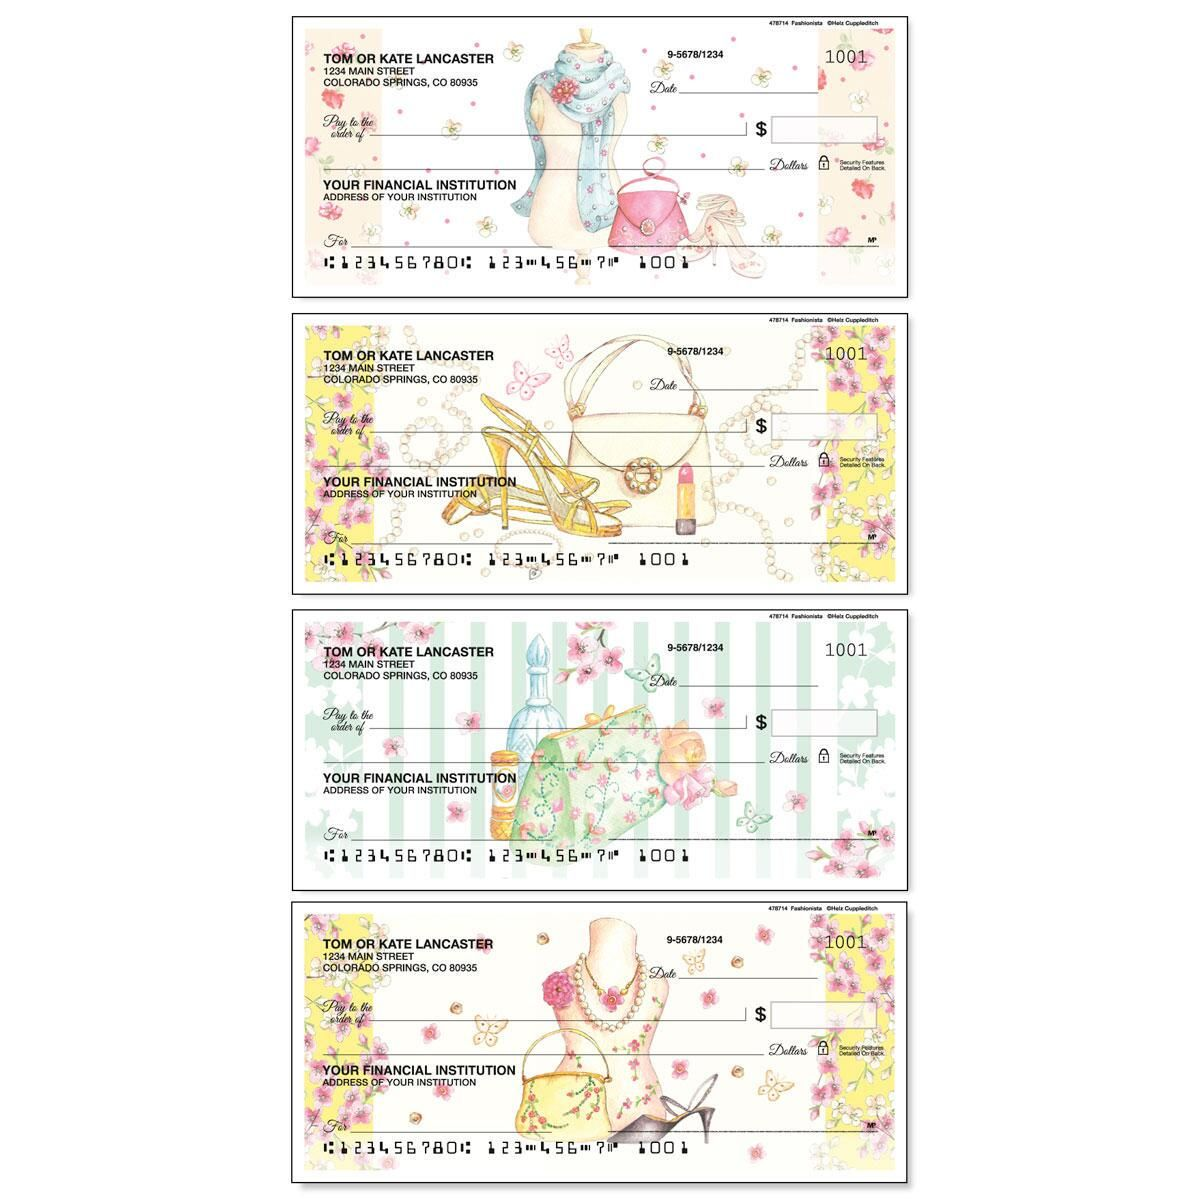 Fasionista Duplicate Checks